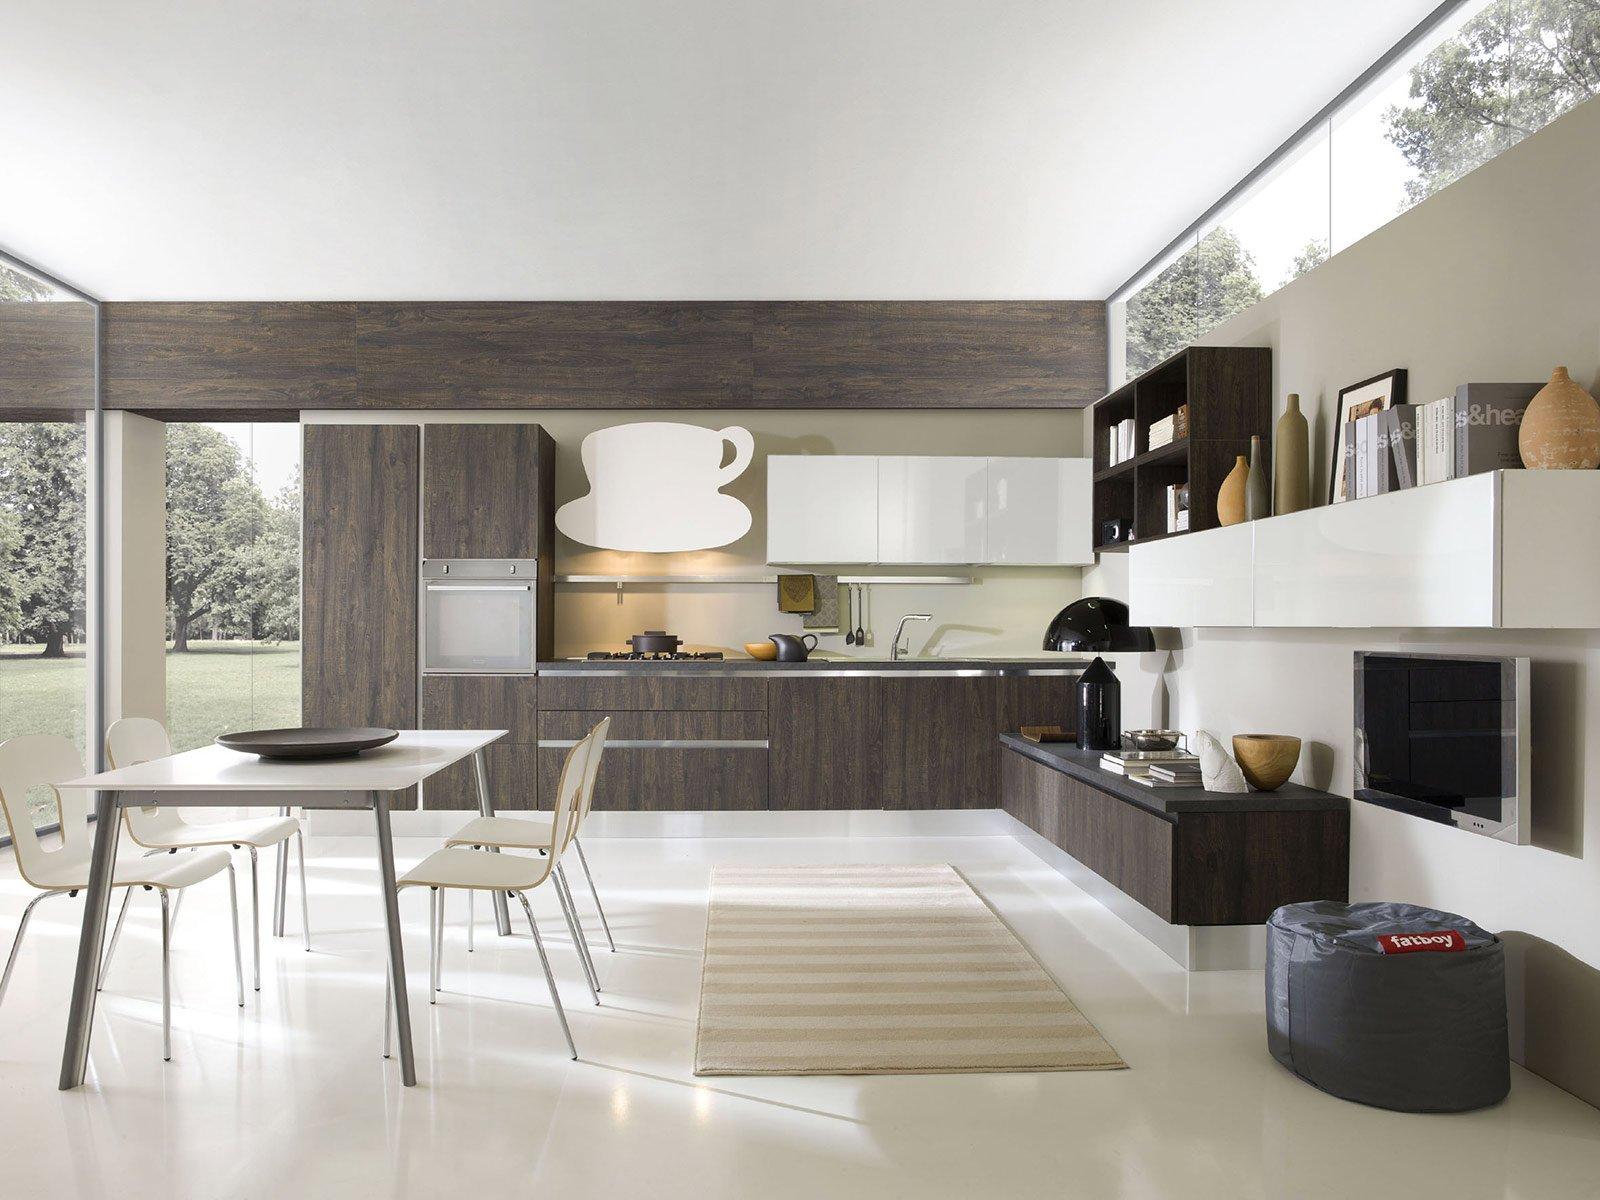 Cucine Con Ante Lisce. Stile Contemporaneo Cose Di Casa #756A56 1600 1200 Aran O Veneta Cucine